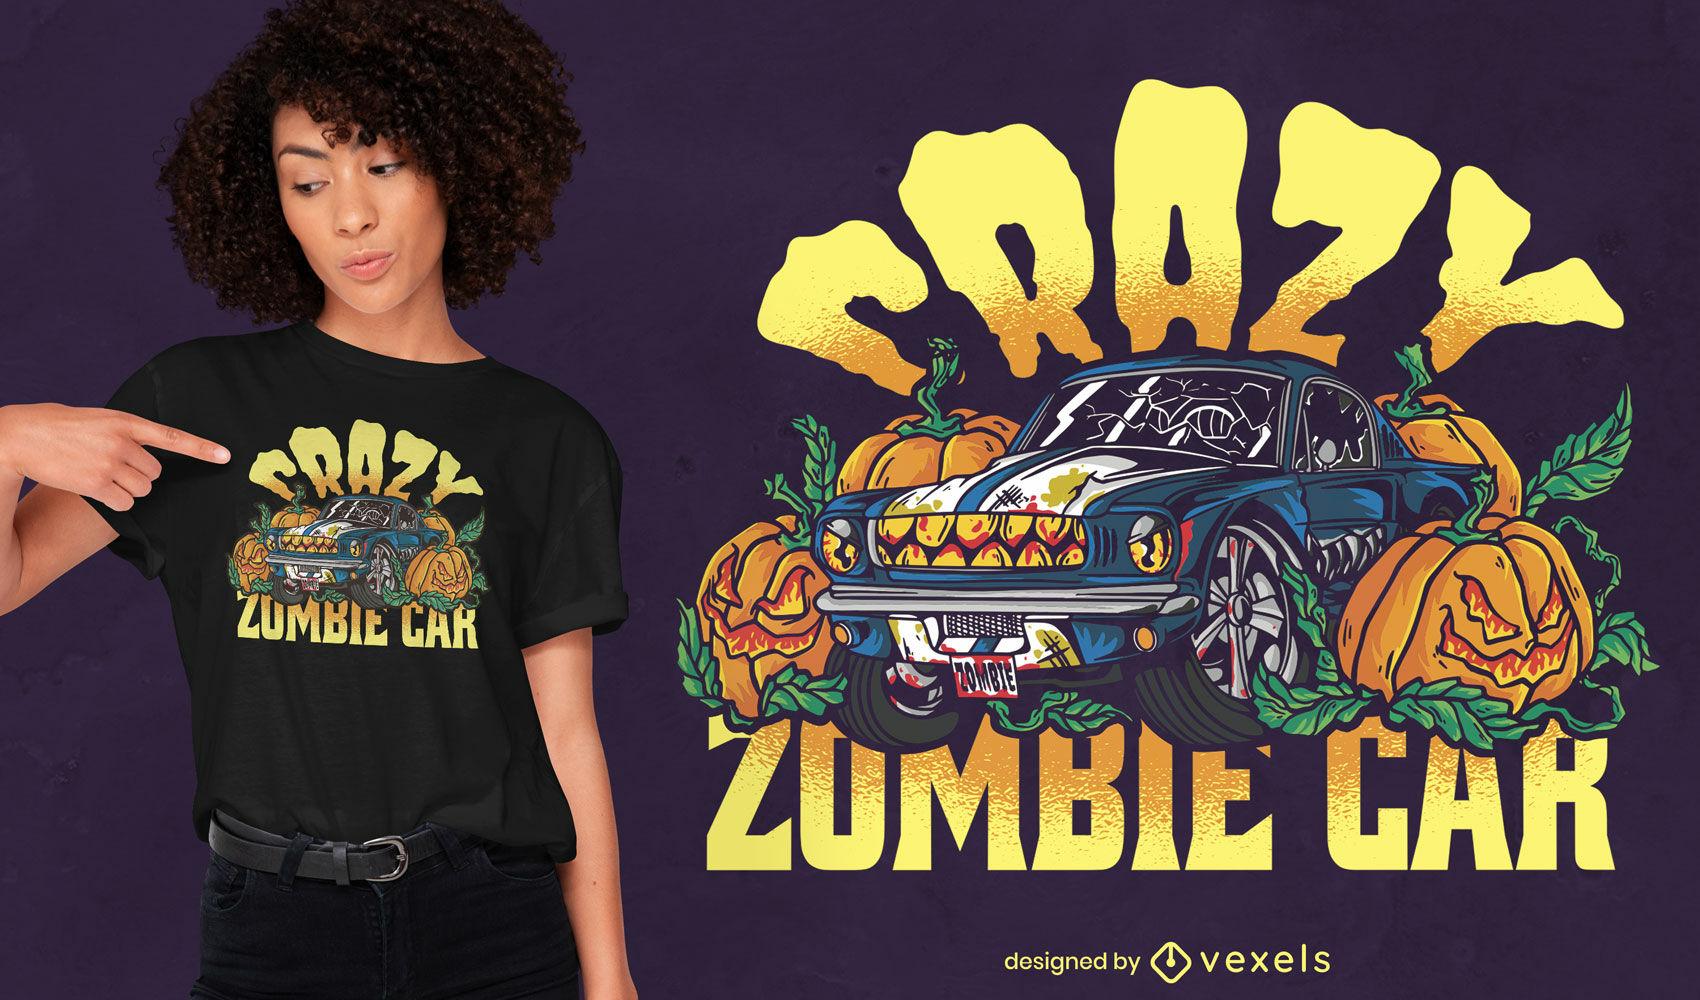 Dise?o de camiseta de coche zombie loco espeluznante